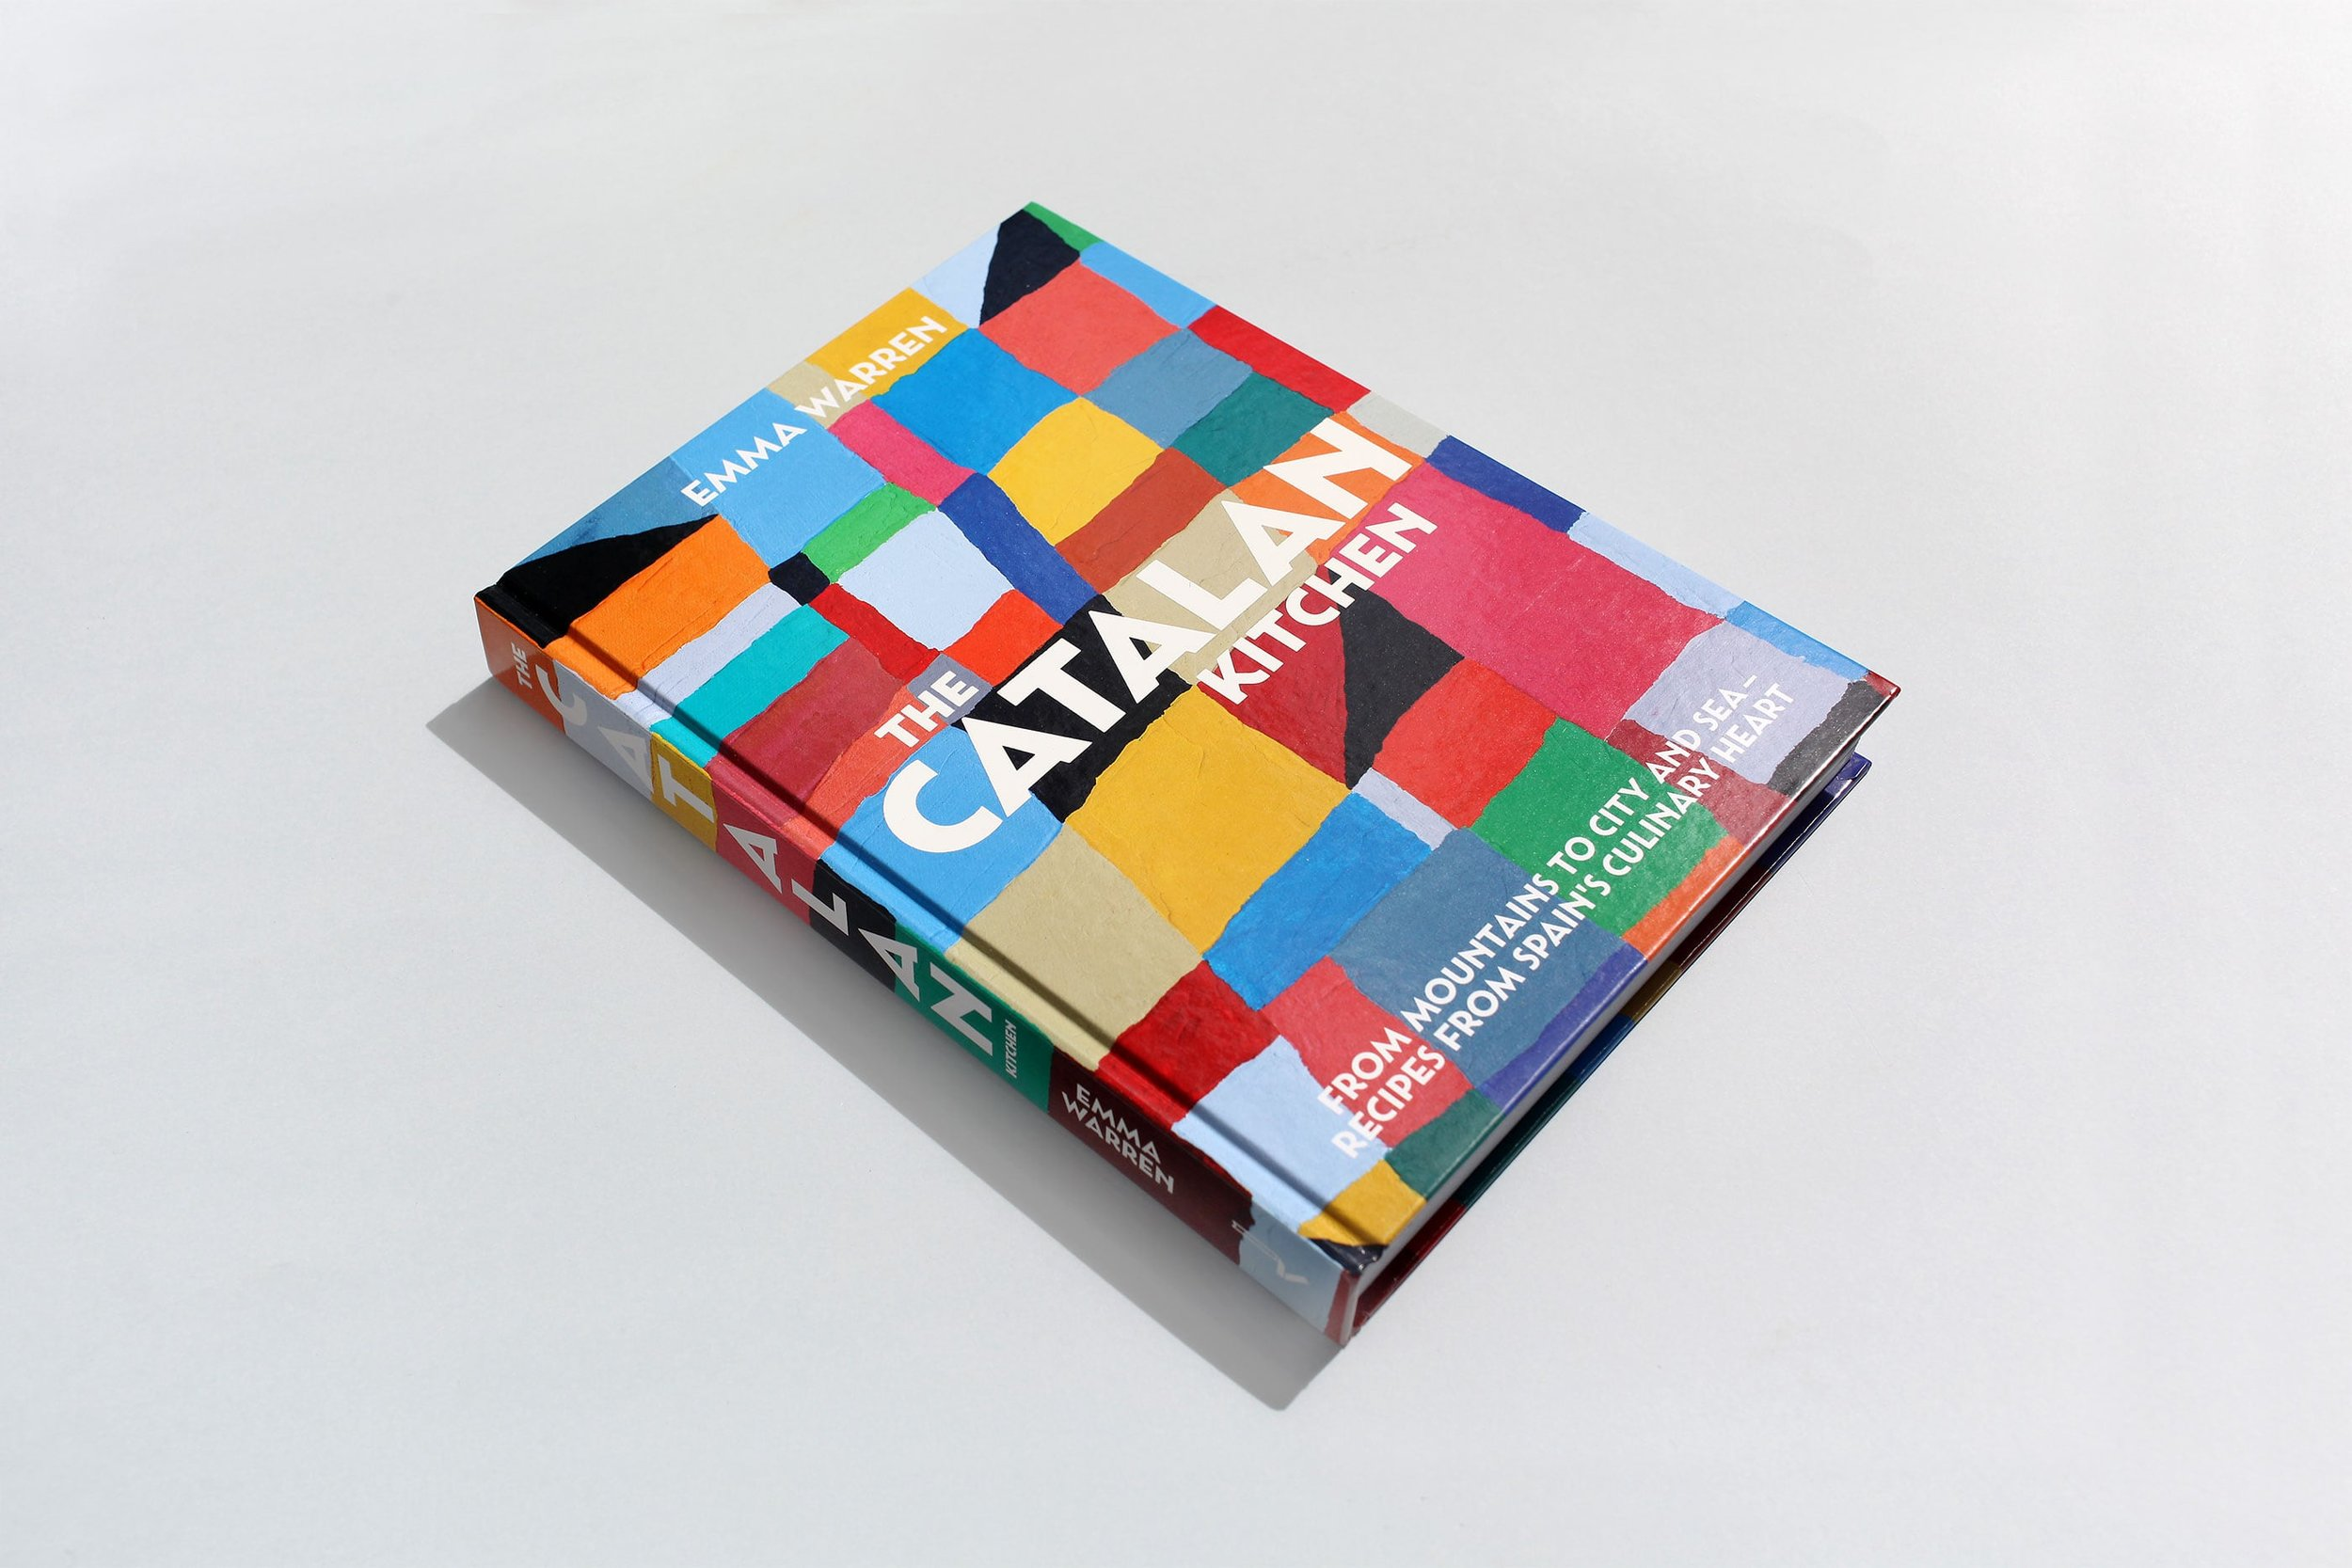 Title – The Catalan Kitchen Author – Emma Warren Design & Illustration – Daniel New Photographer – Rochelle Eagle Stylist – Lee Blaylock Publisher – Smith Street Books